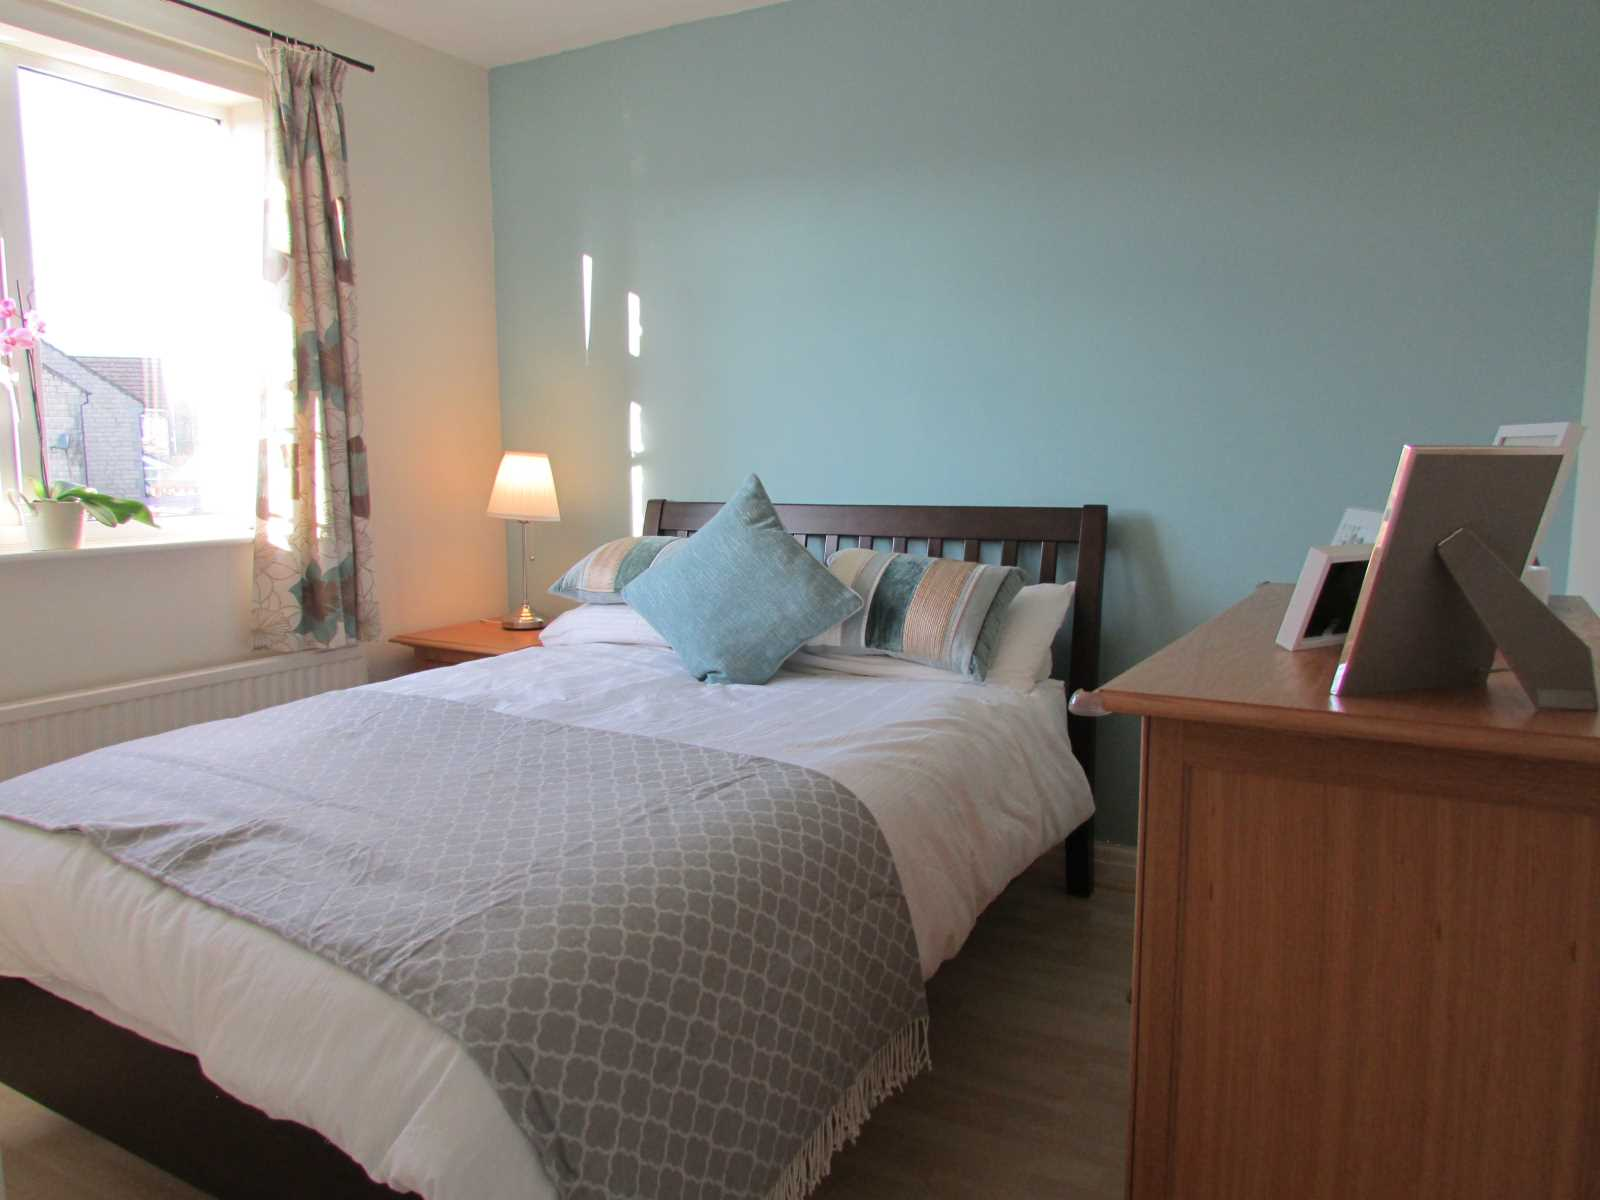 6 Lavender Court, Netherton, Huddersfield, HD4 7LW